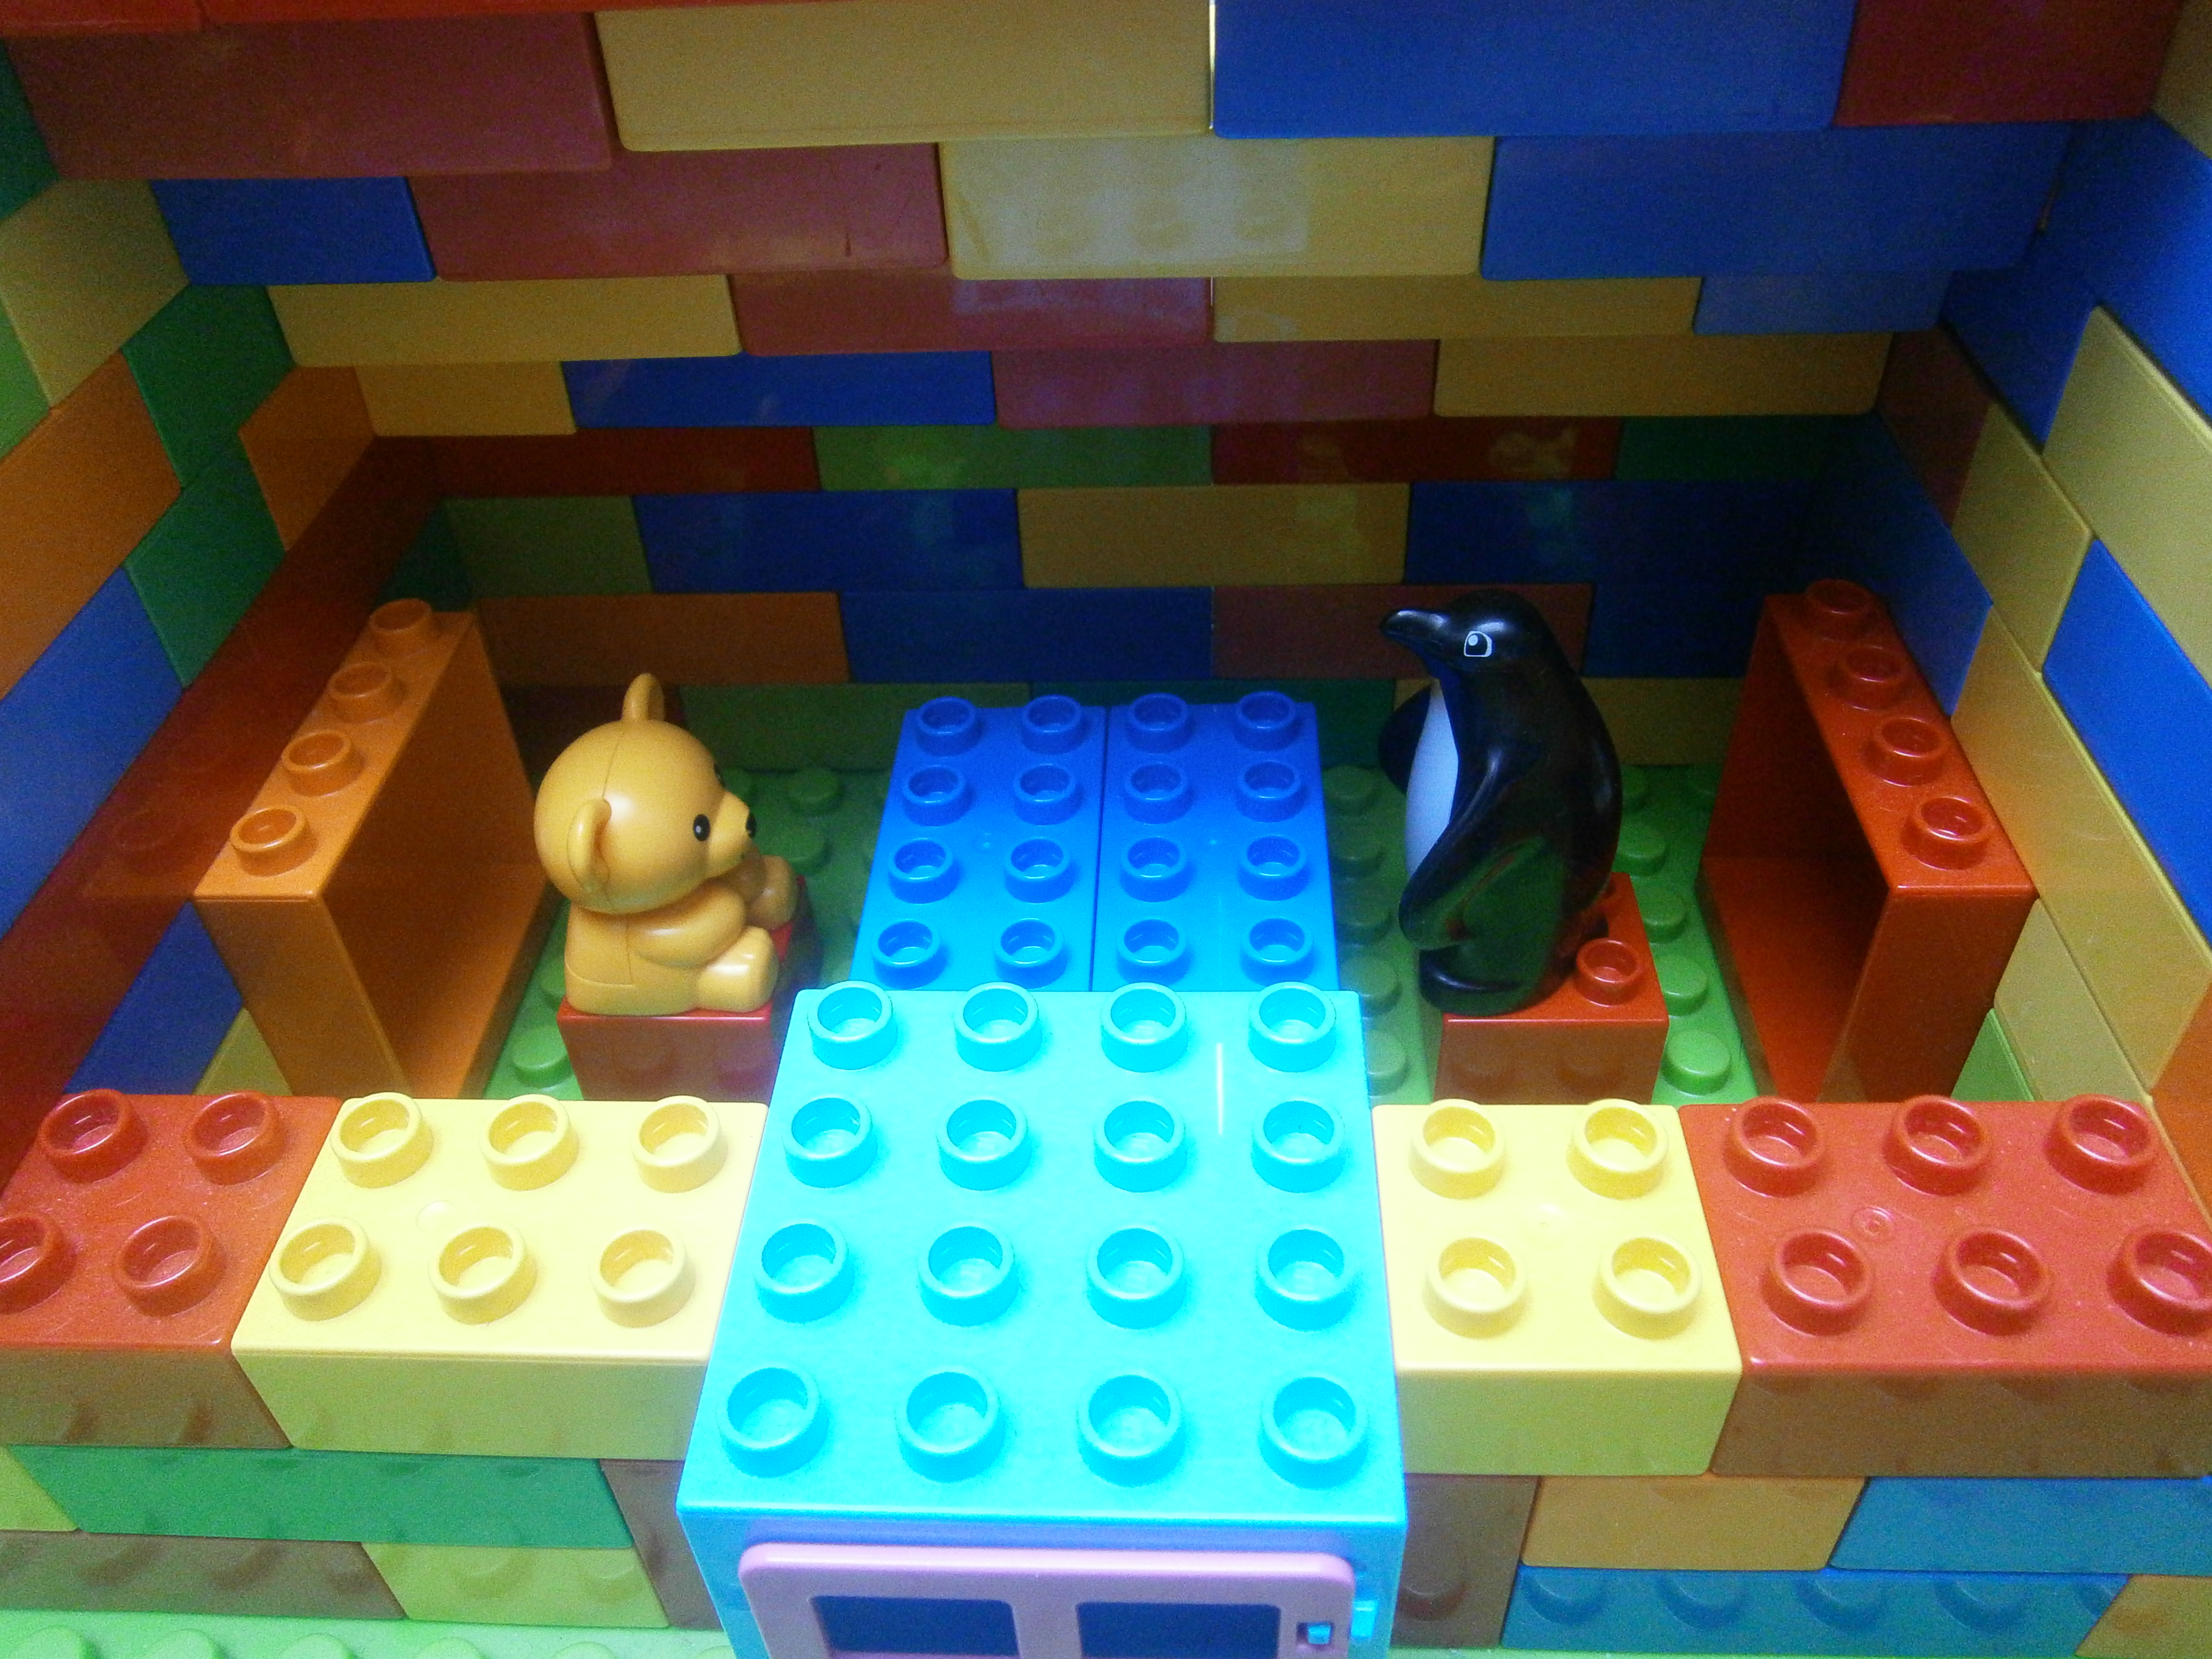 Lego Moc 1727 Duplo House Duplo 2014 Rebrickable Build With Lego